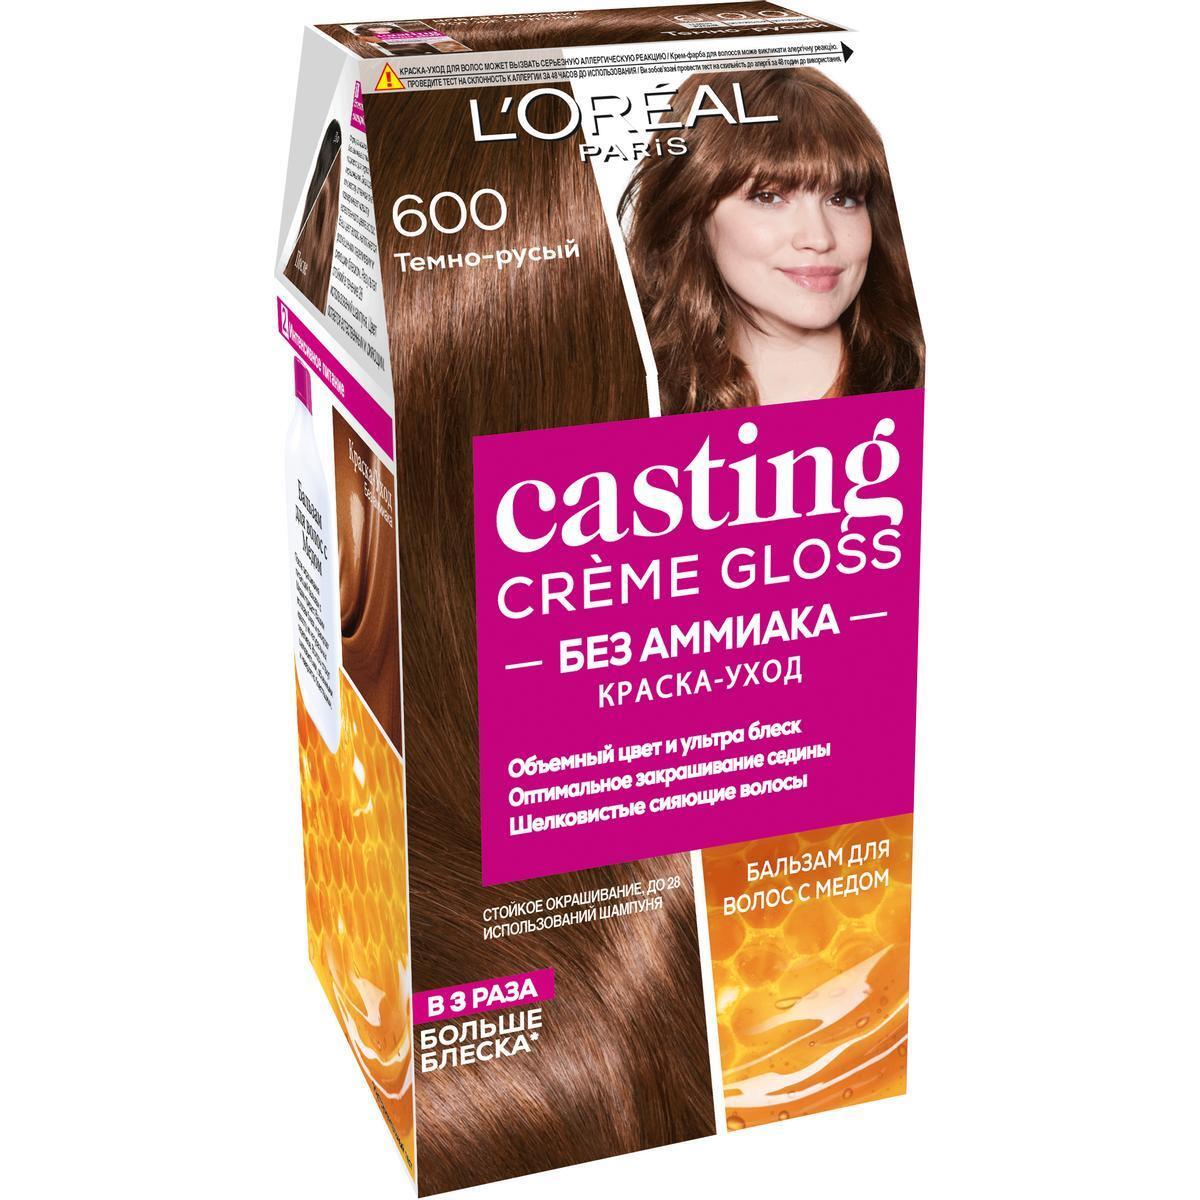 "L'Oreal Paris Стойкая краска-уход для волос ""Casting Creme Gloss"" без аммиака, оттенок 600, Темно-русый #1"